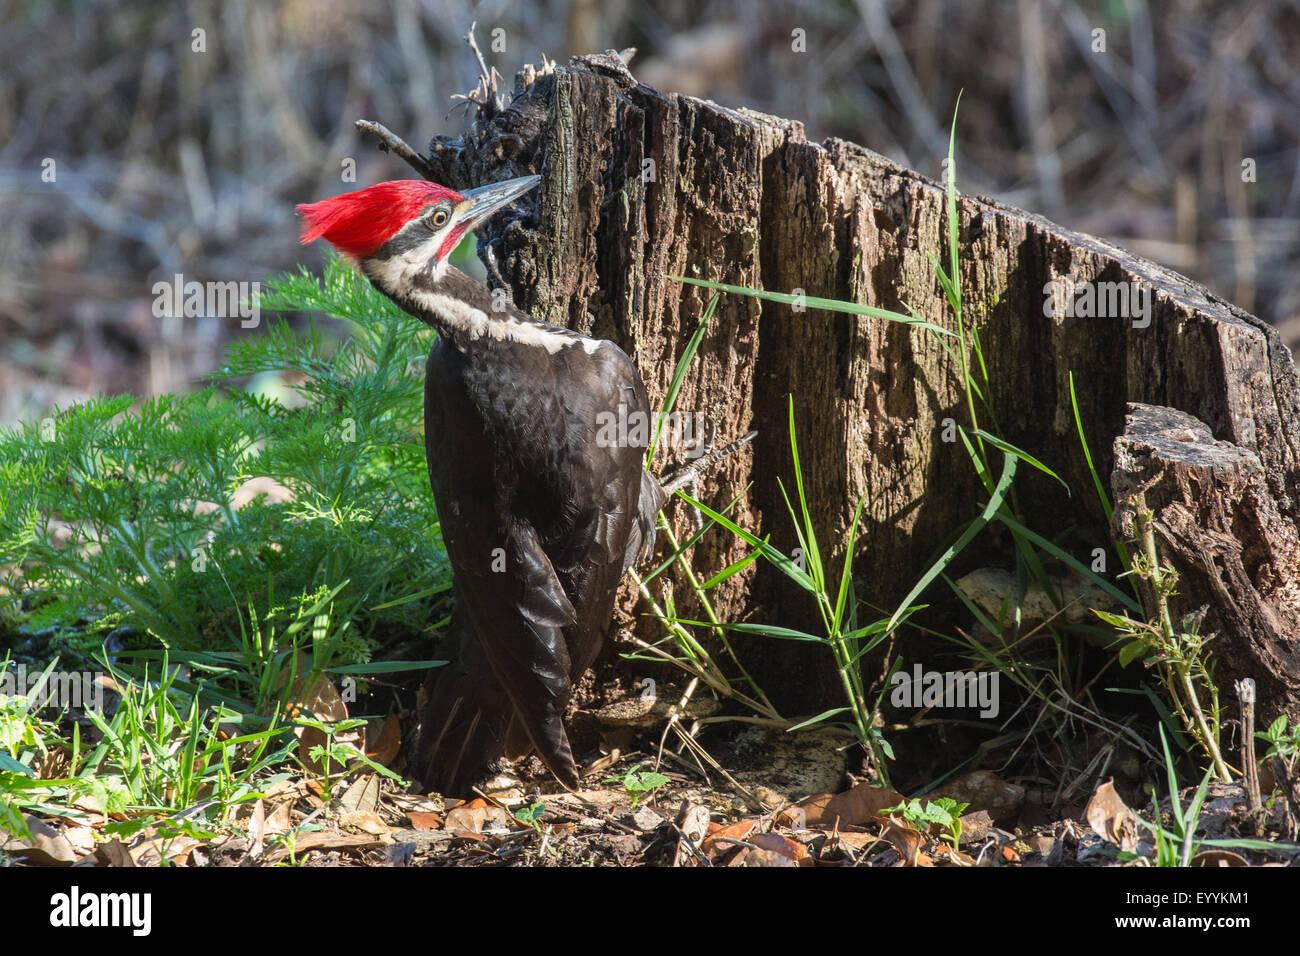 Pileated woodpecker (Dryocopus pileatus), male on the feed at deadwood, USA, Florida, Kissimmee - Stock Image